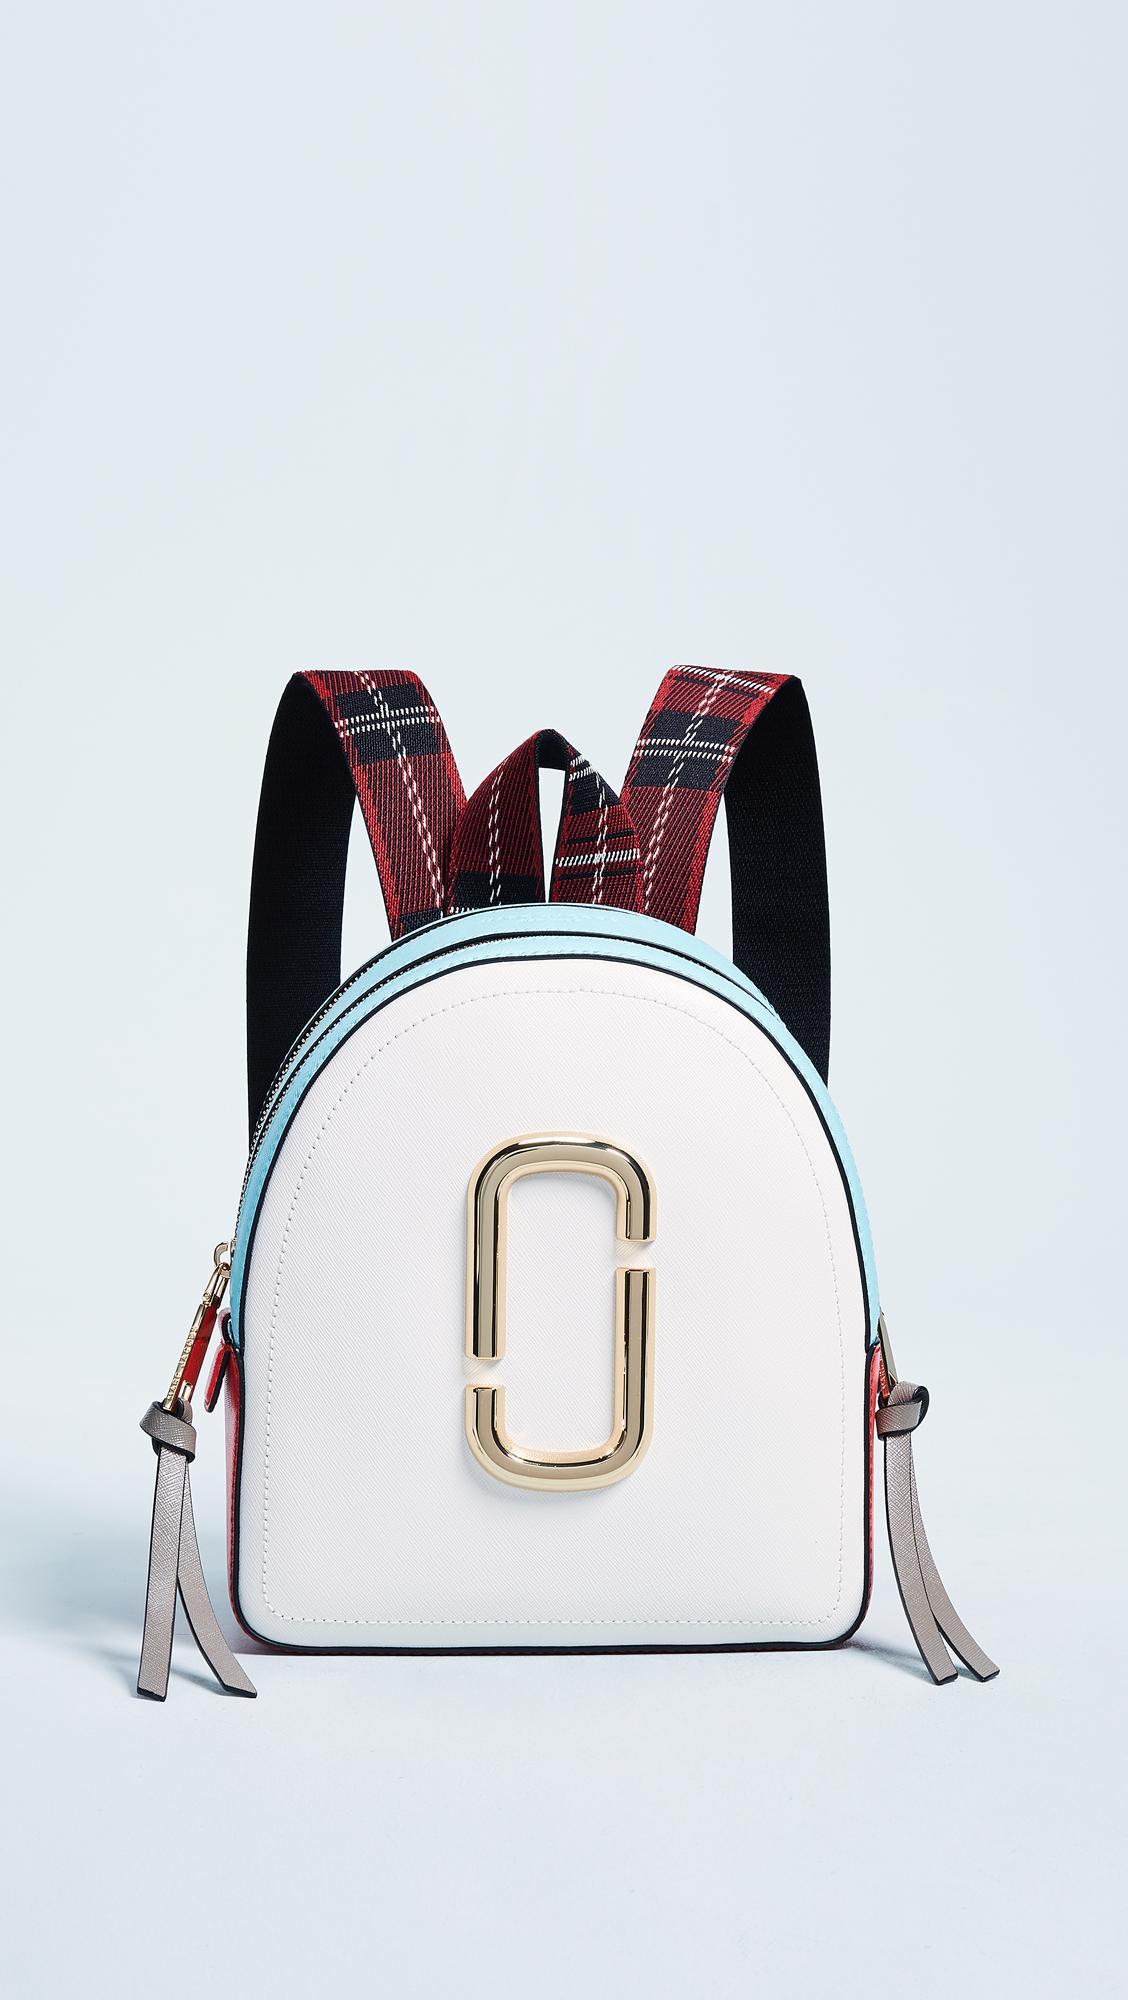 e7d4dc9748de Lyst - Marc Jacobs Packshot Backpack